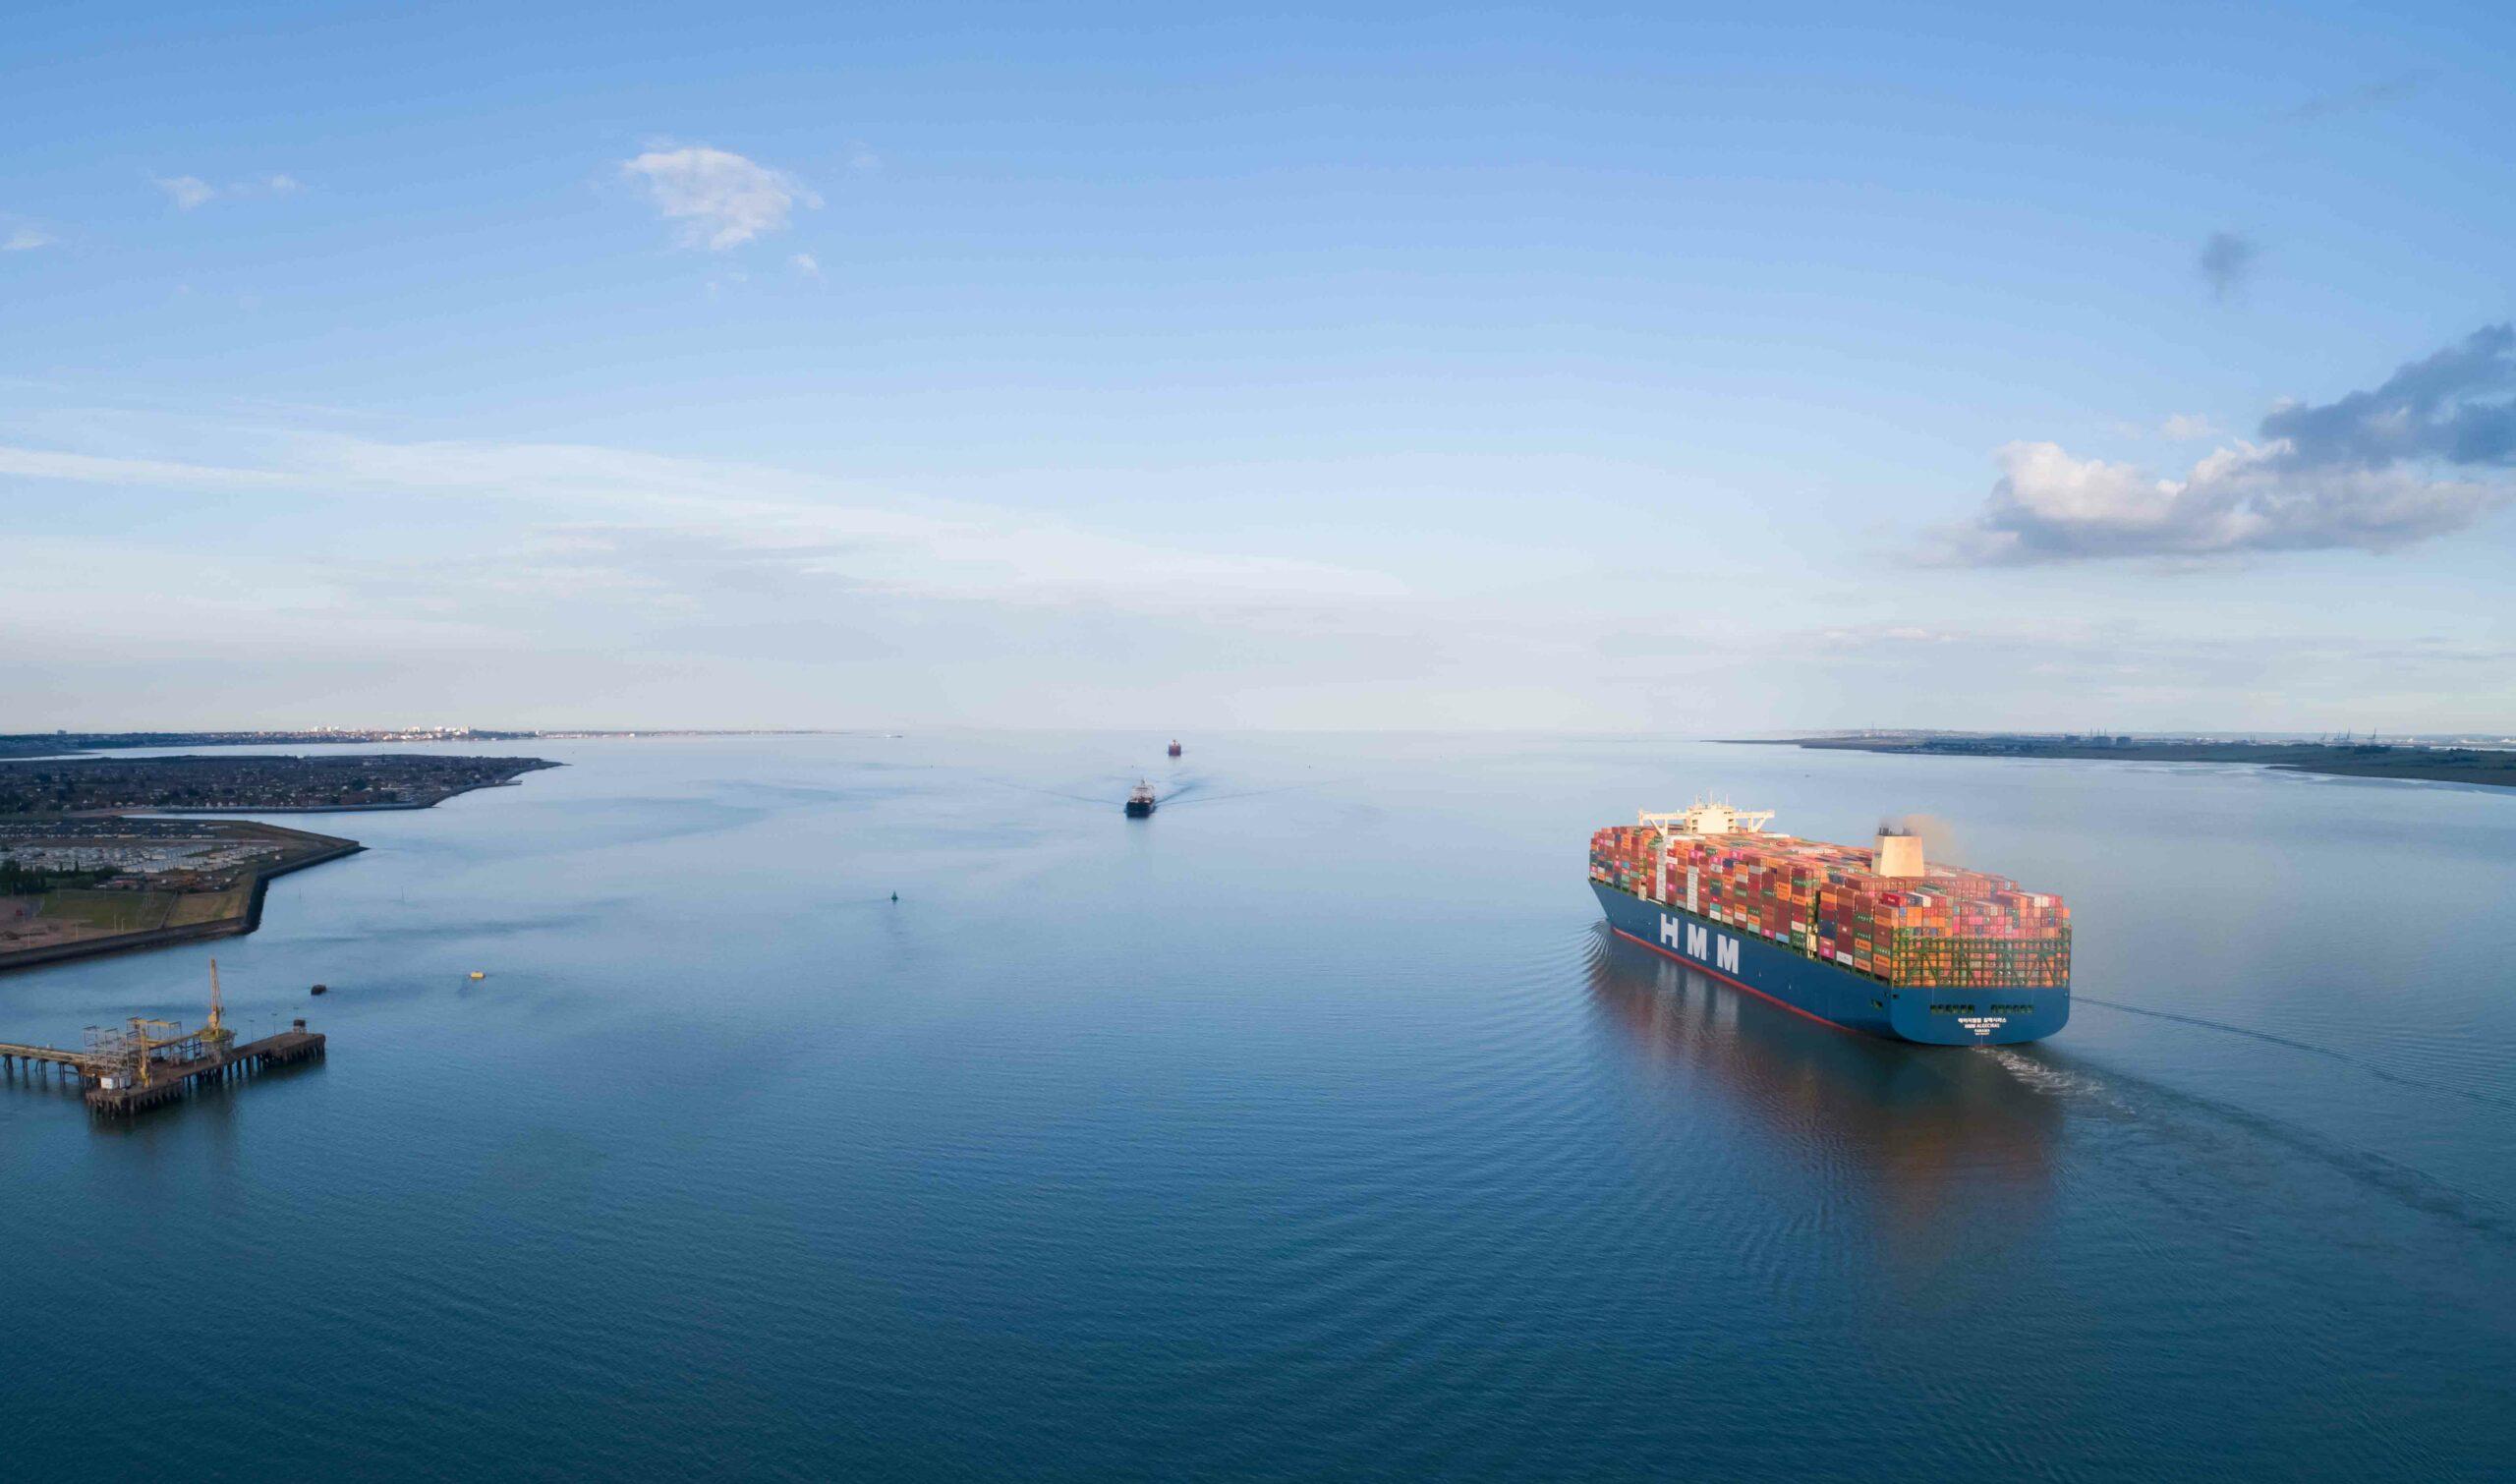 HMM observers remain cautious despite surging profit results Atlas logistic network